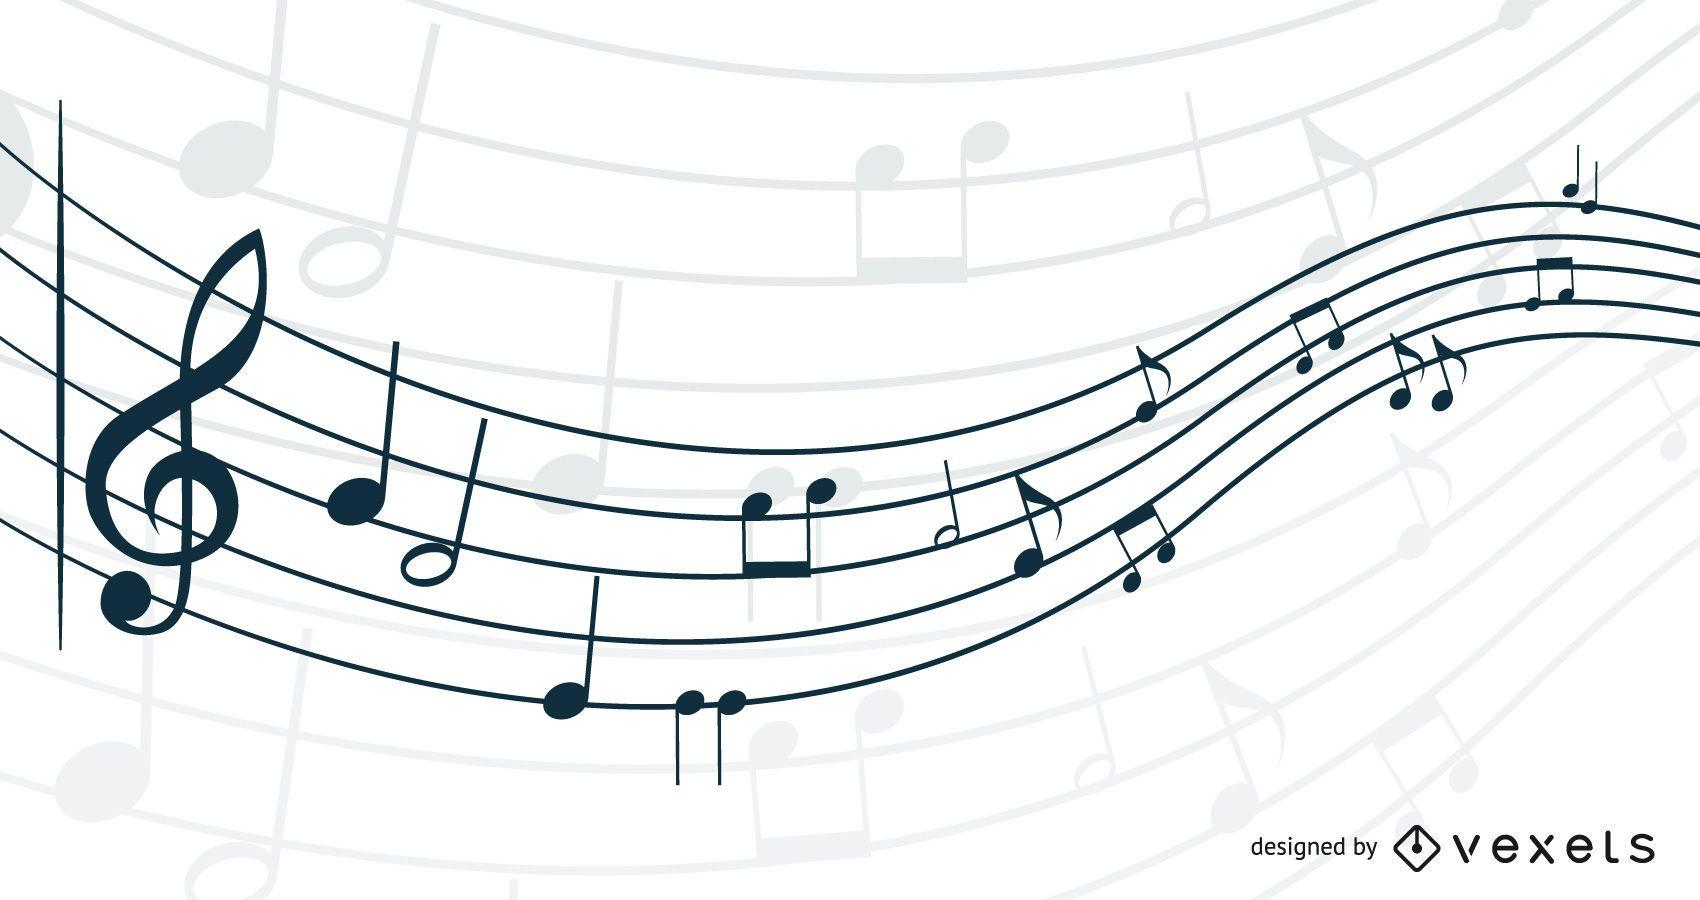 Waving 3D Musical Note